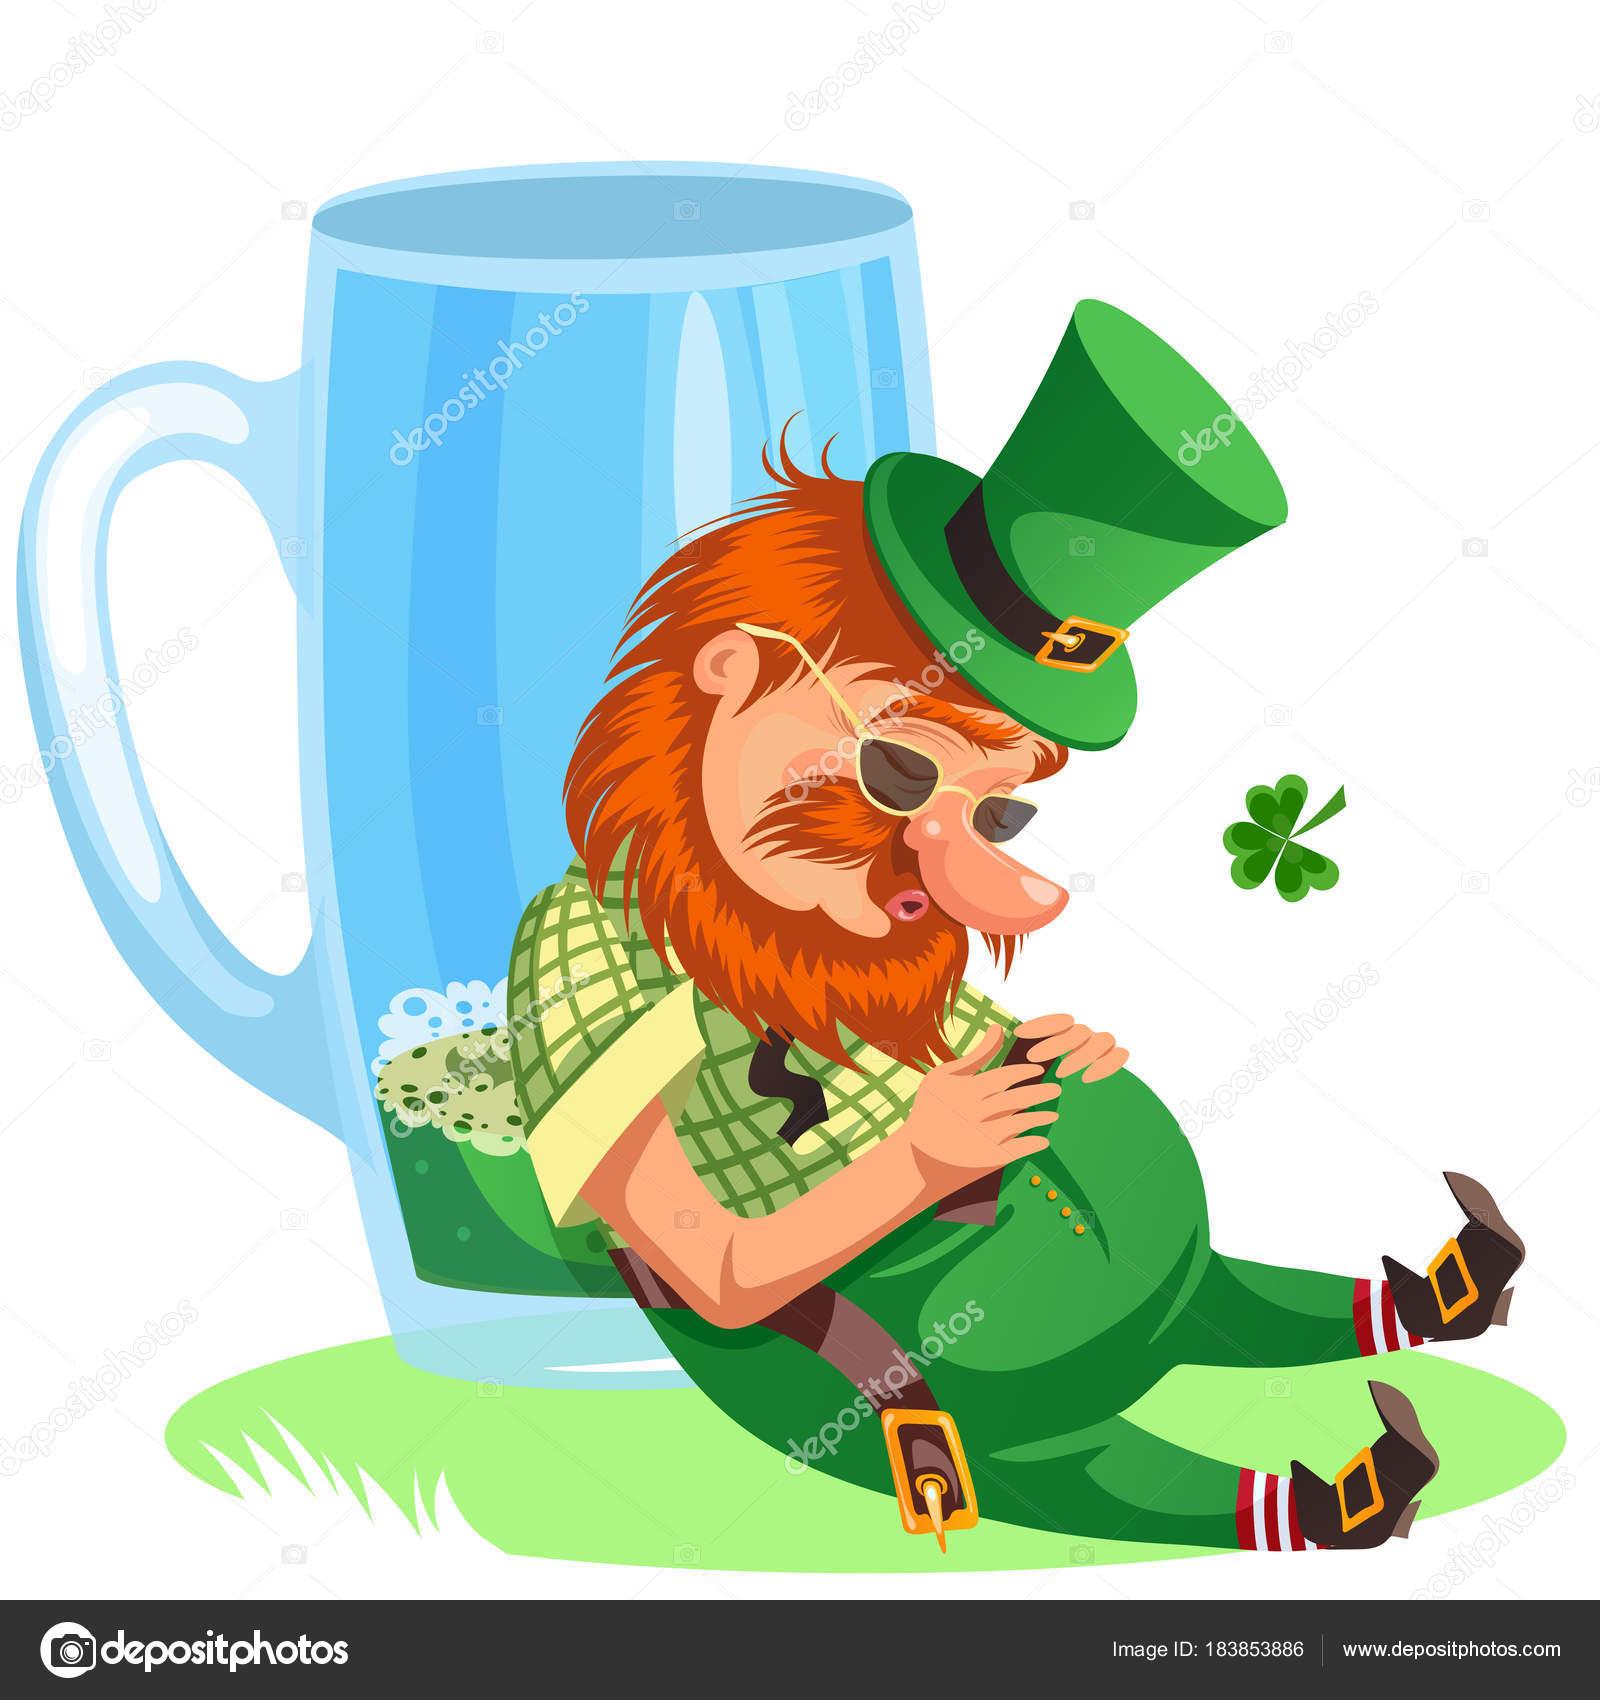 irlandais ivre.jpg